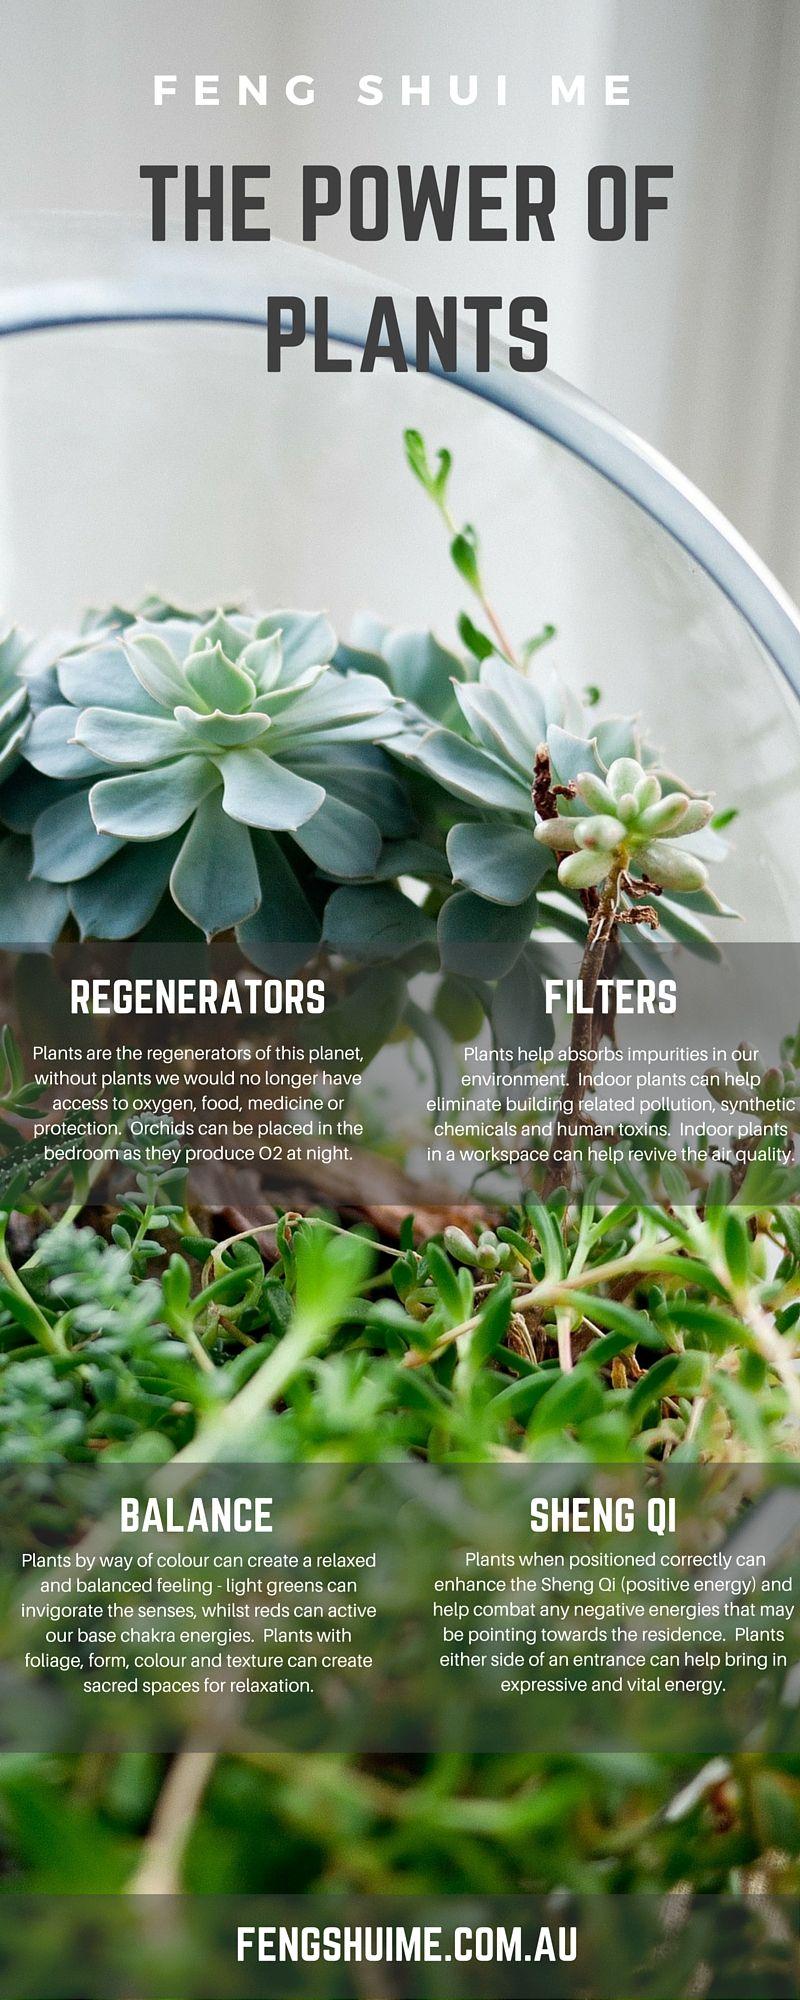 the power of plants feng shui regenerate filter balance positive energy fengshui www. Black Bedroom Furniture Sets. Home Design Ideas